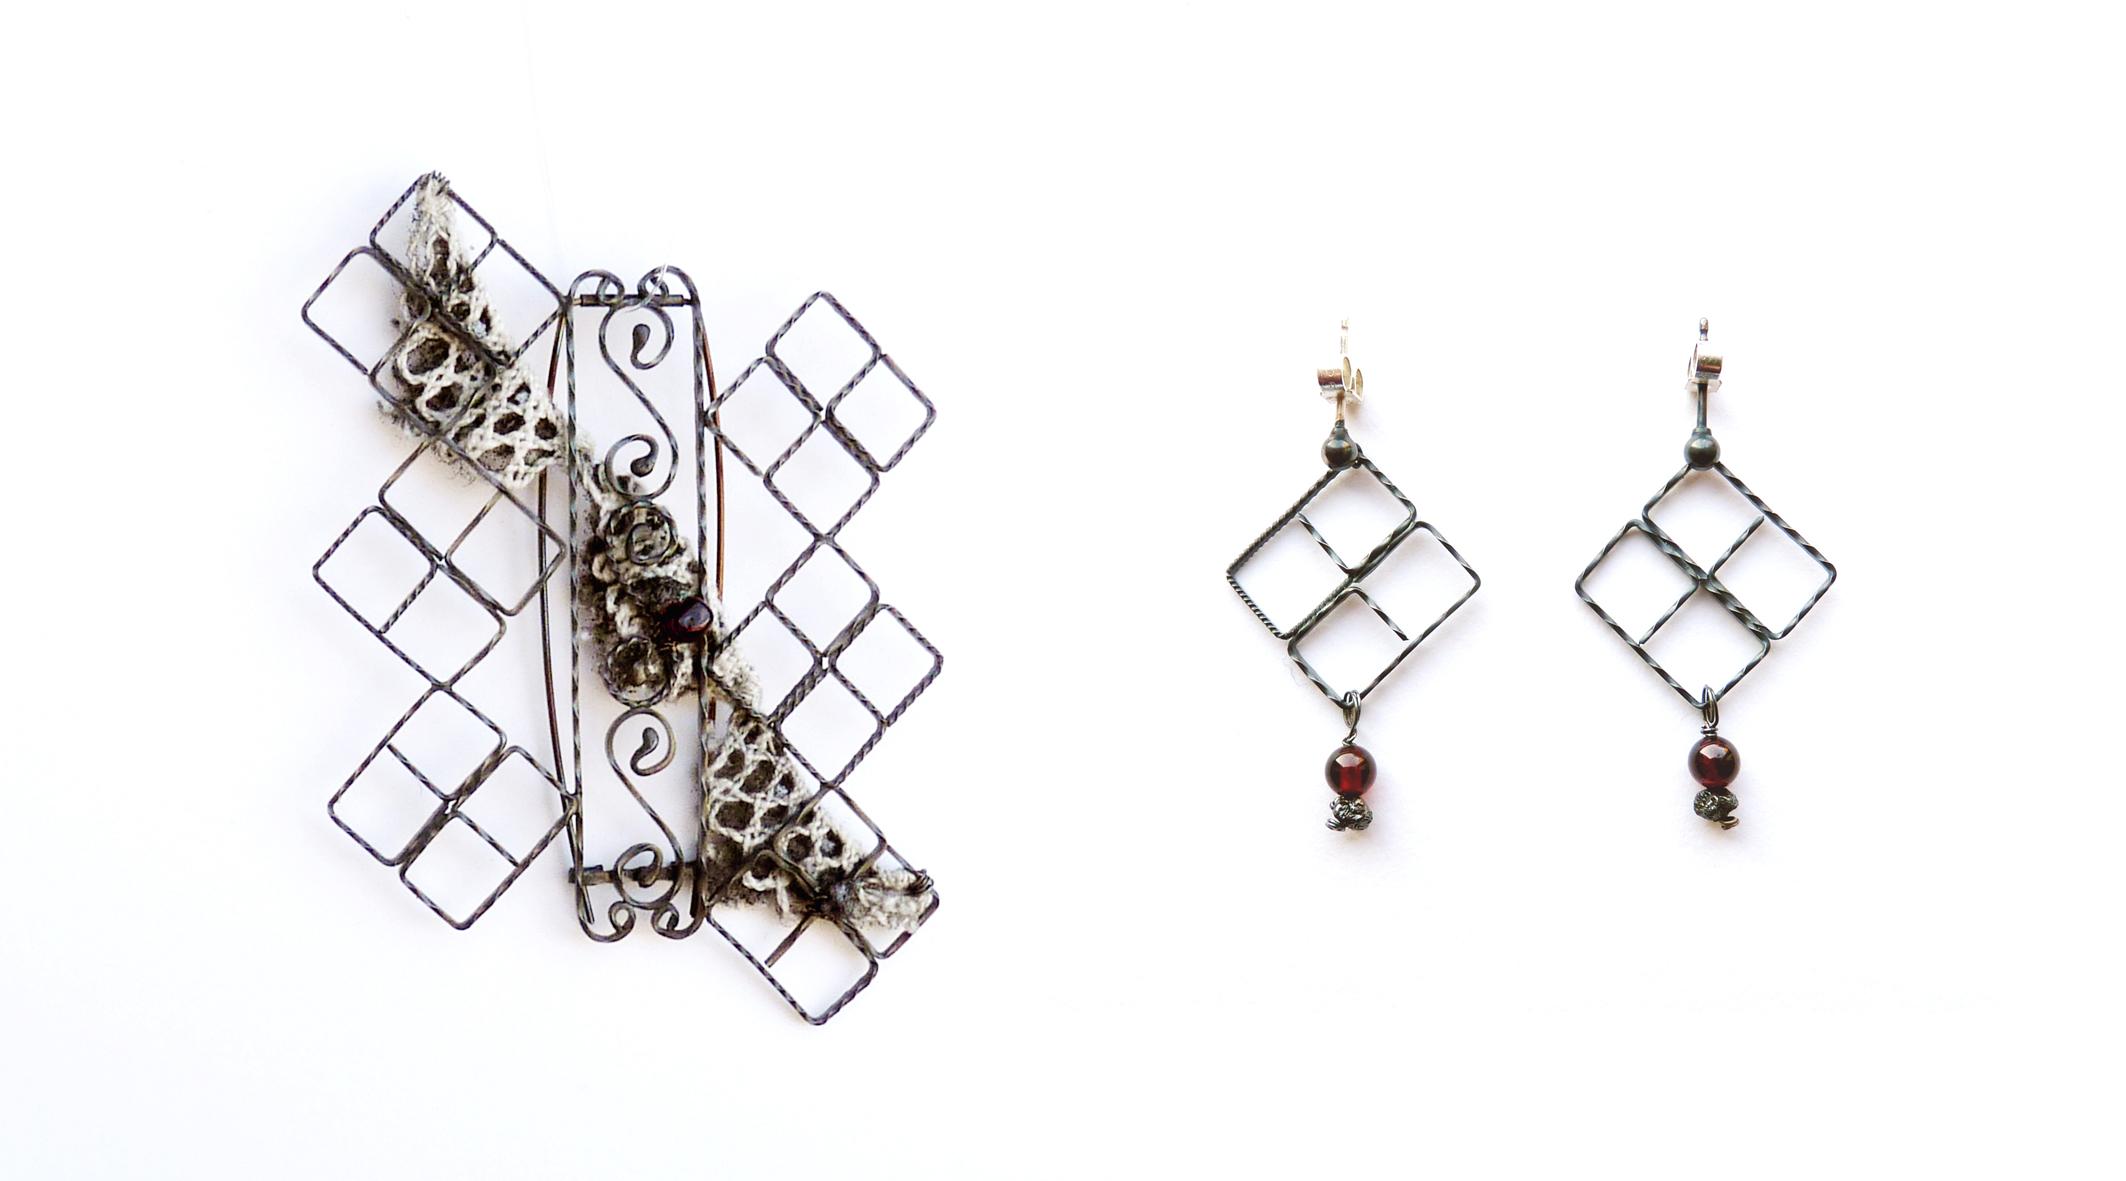 Cross Railings Brooch and Earrings -  oxidised silver, garnet, rough diamond, vintage lace. 2012